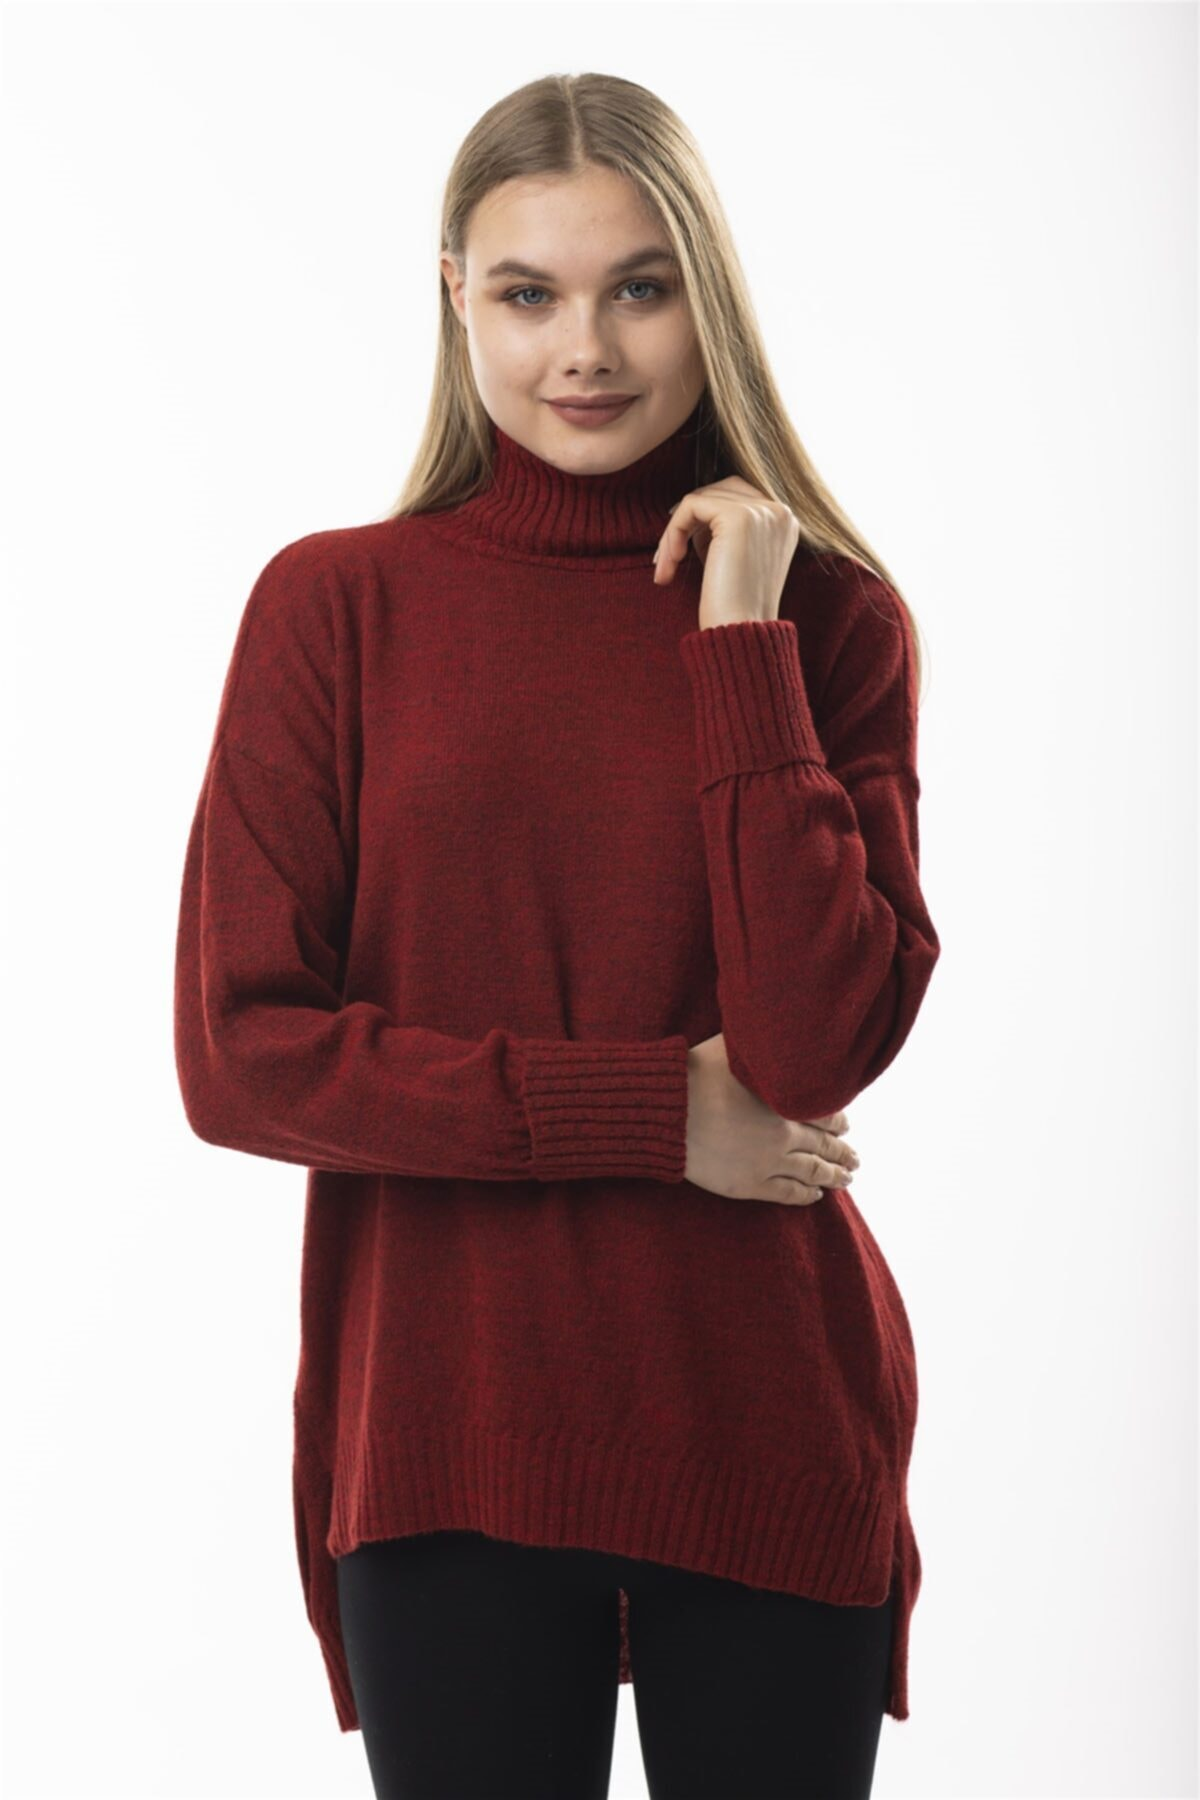 STAMINA 2f103 Triko Bluz-koyu Kırmızı 1